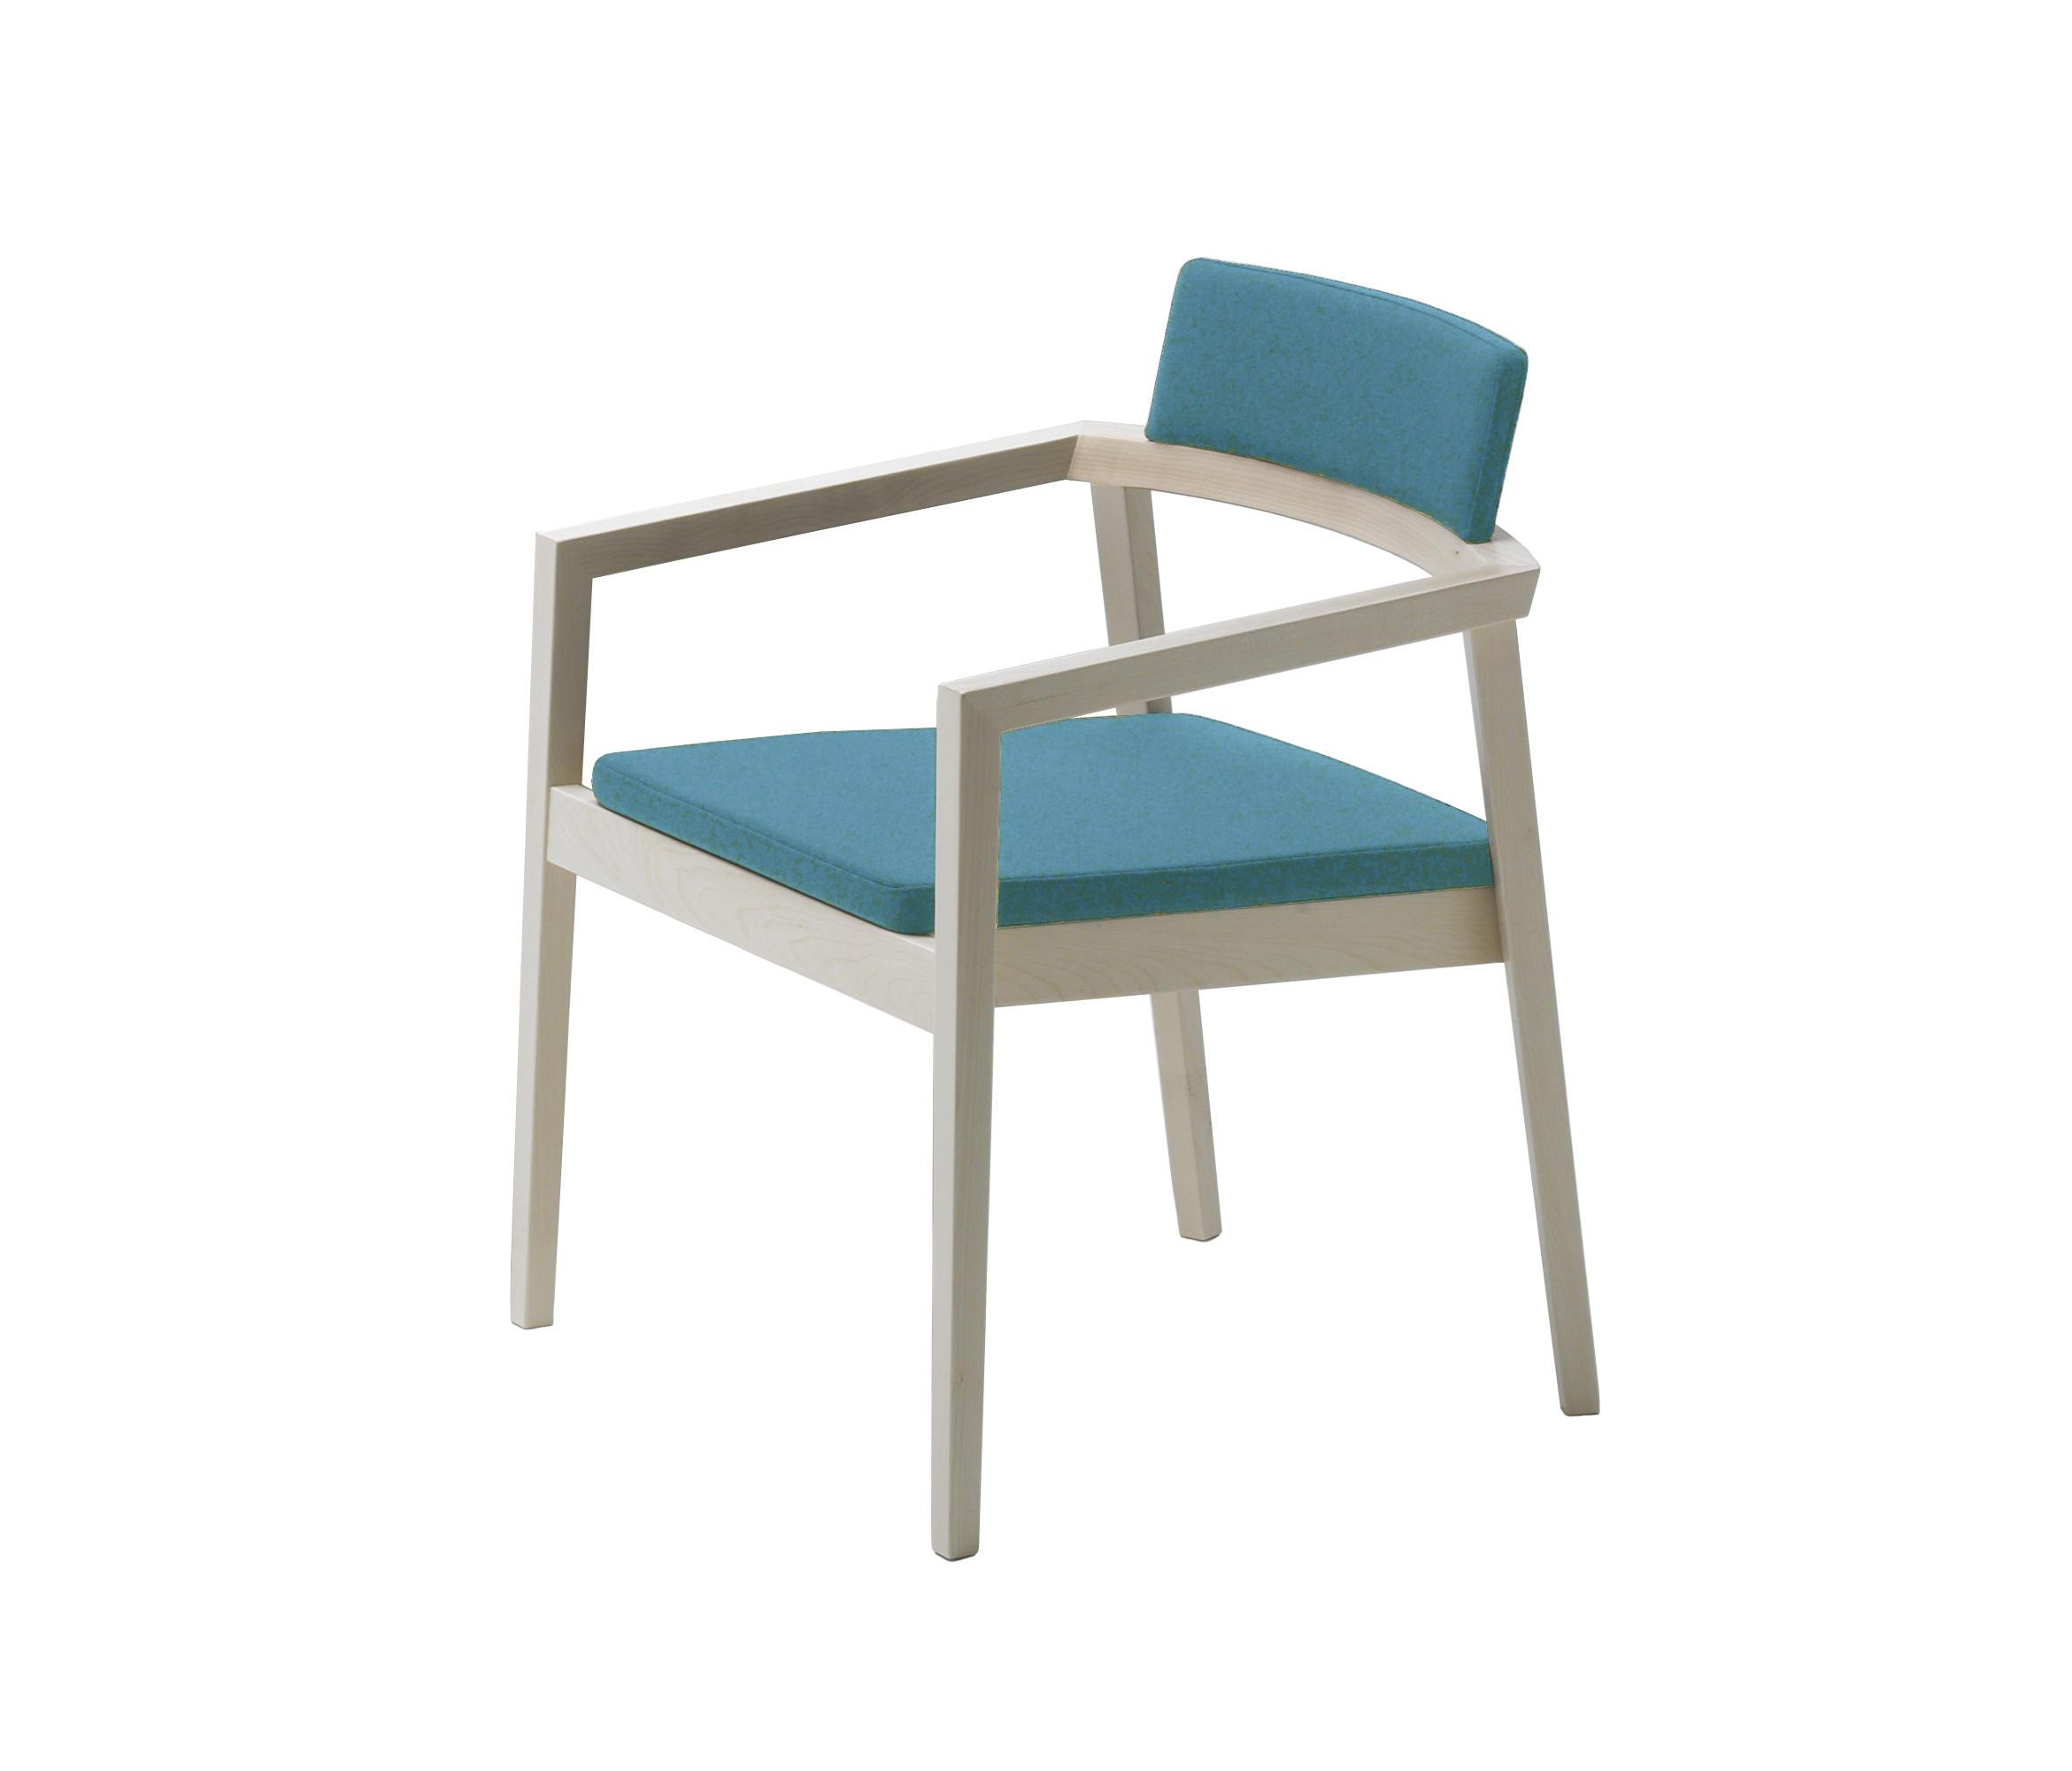 session lounge stuhl loungesessel von magnus olesen architonic. Black Bedroom Furniture Sets. Home Design Ideas